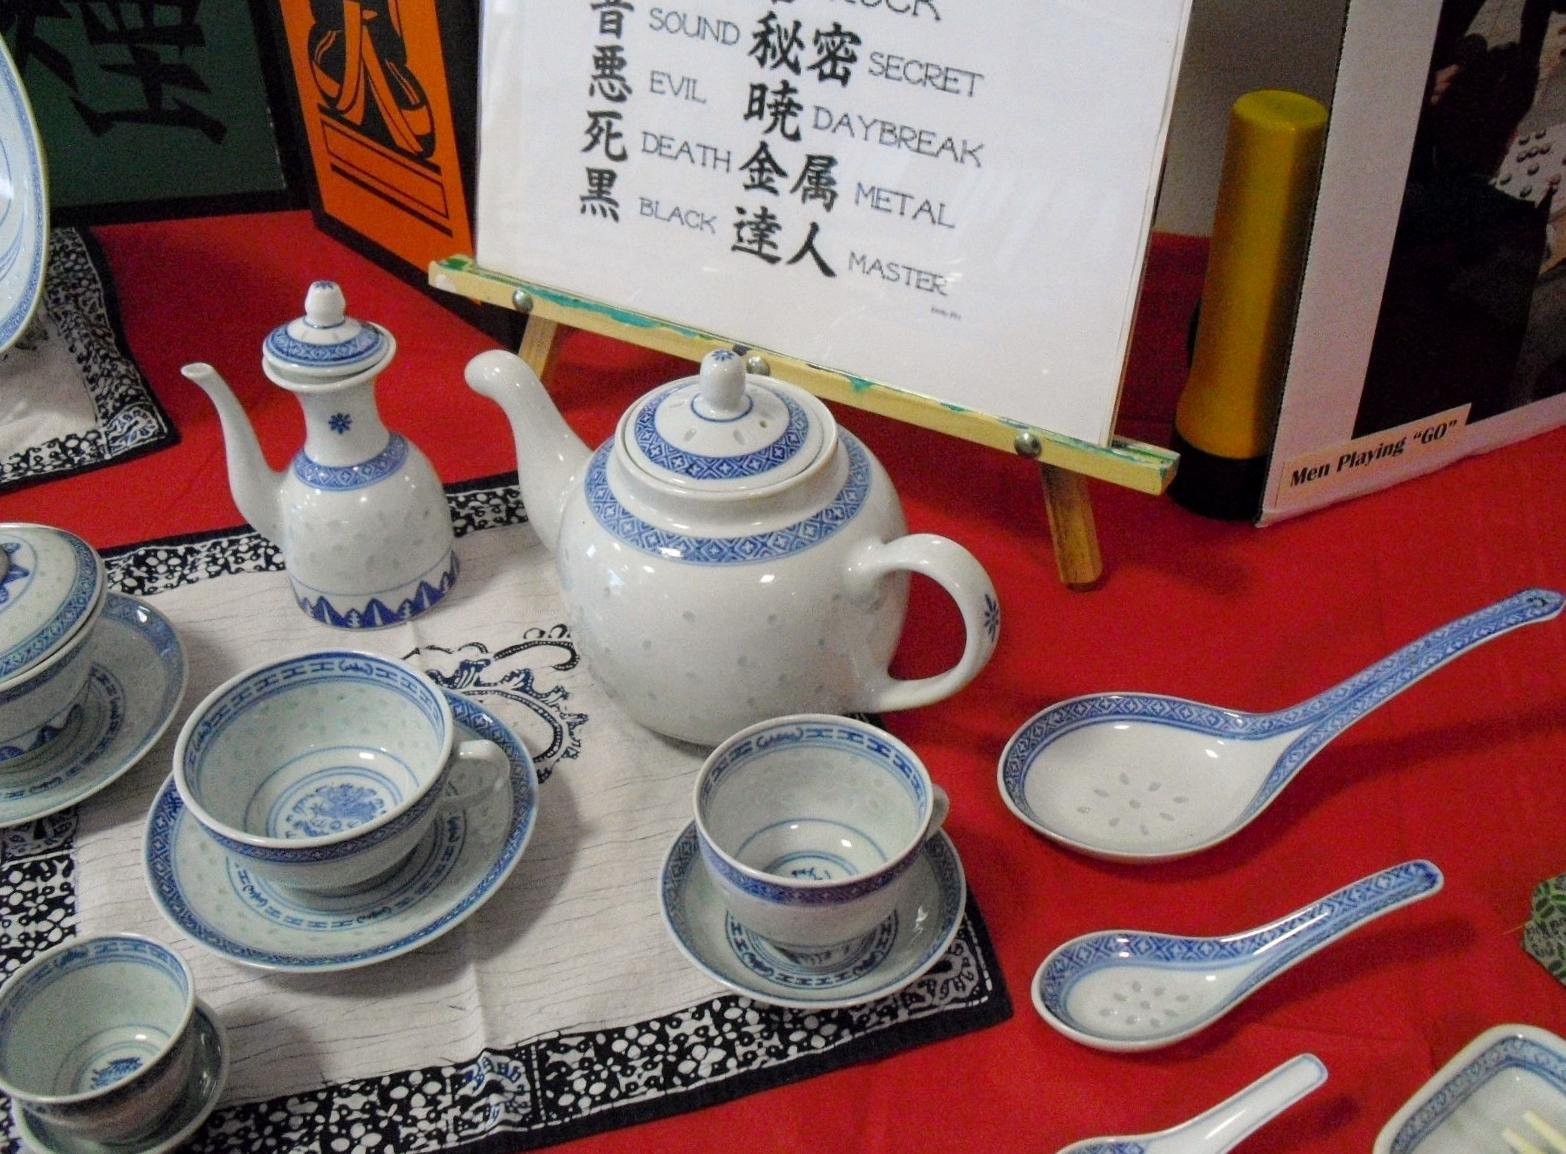 b4483bca5ad63bfb973b_Peter_Becker_-_CU-Rice_dishes_and_Chinese_Writing.jpg